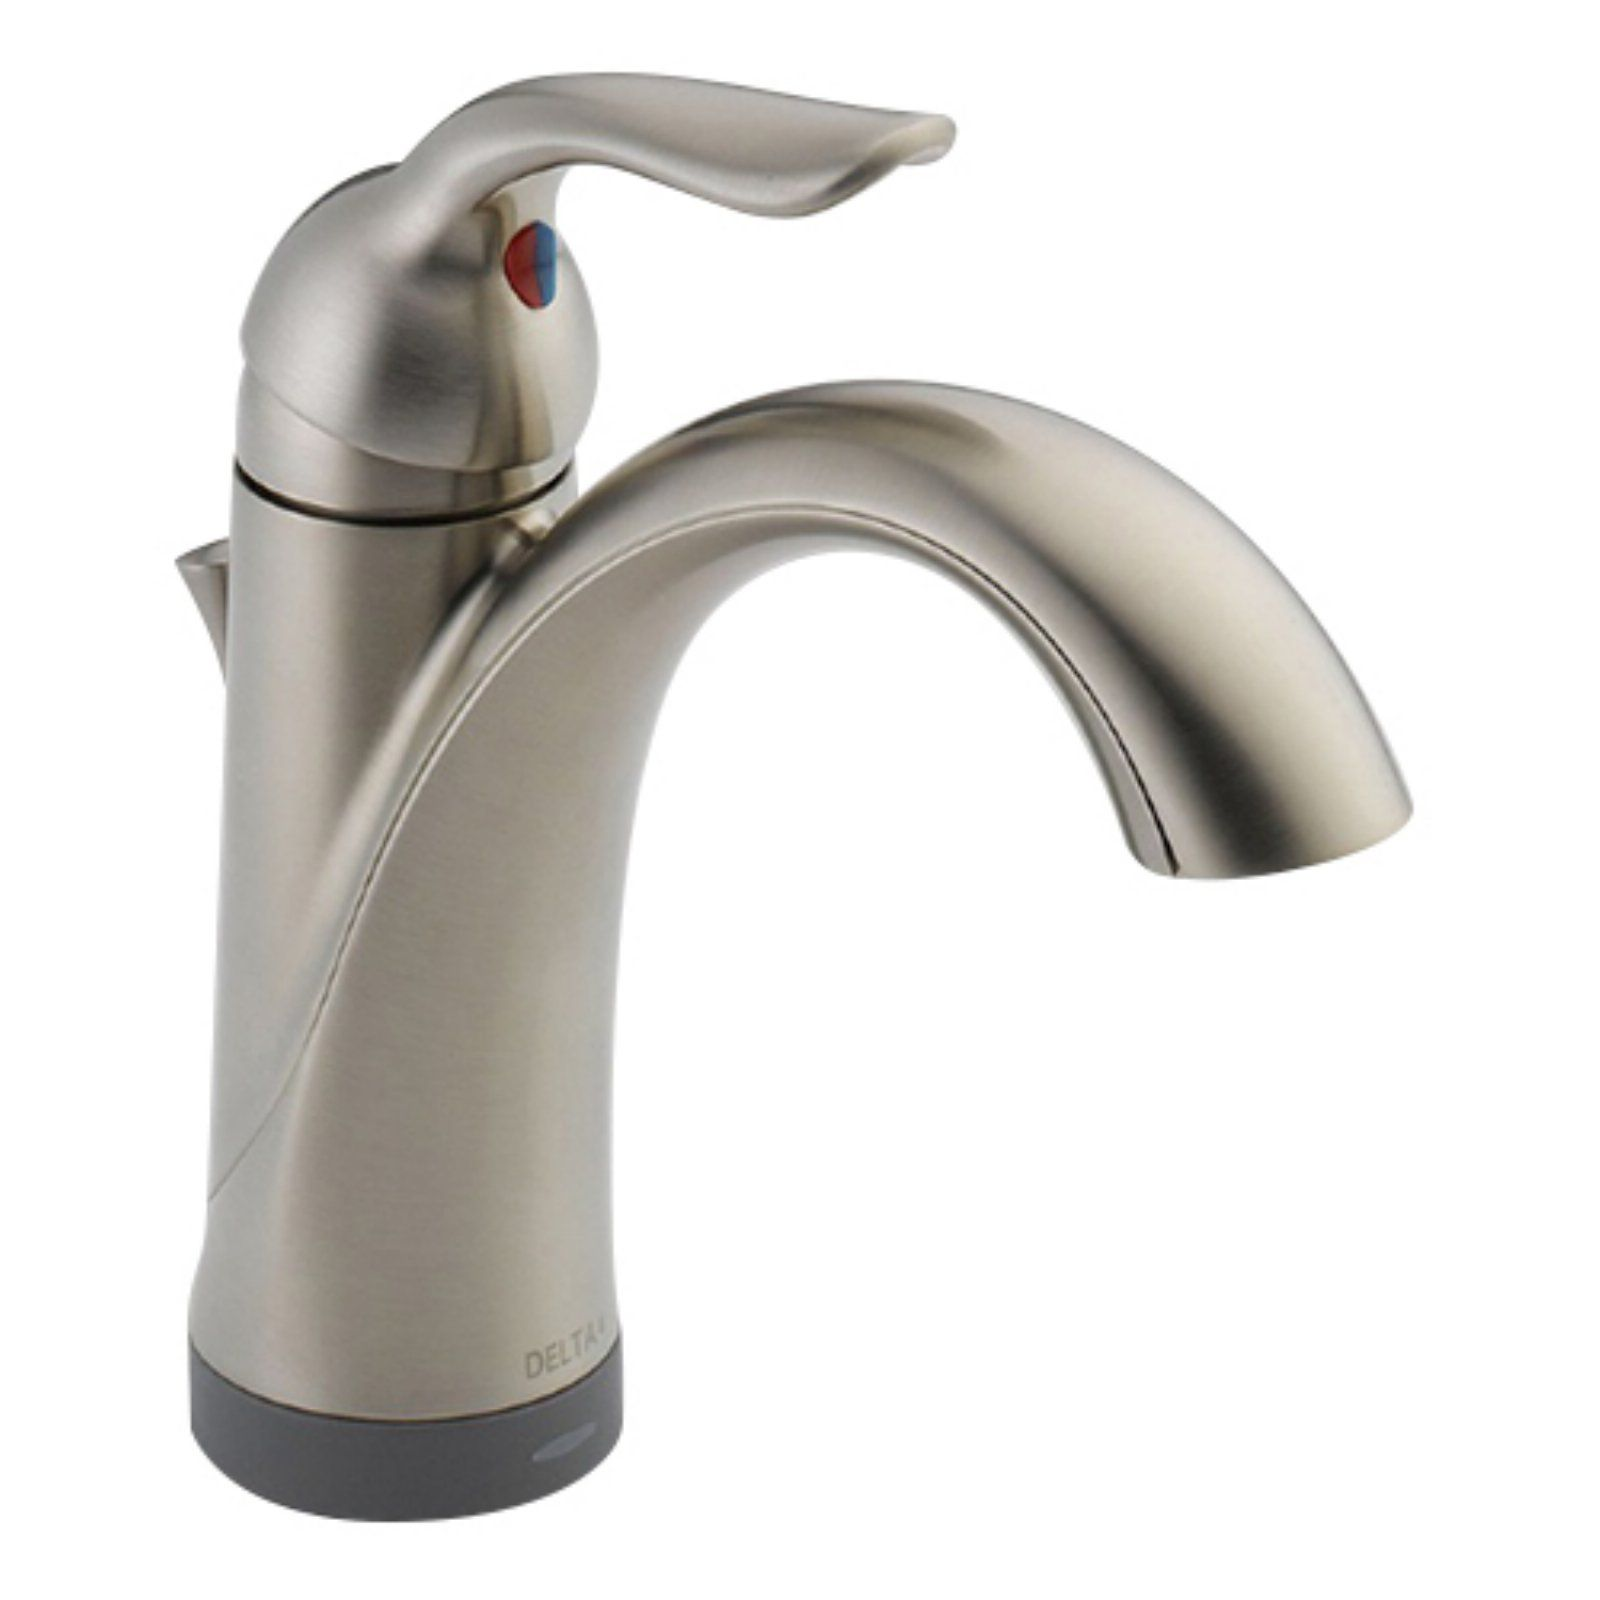 Delta Lahara 15938t Single Handle Bathroom Sink Faucet With